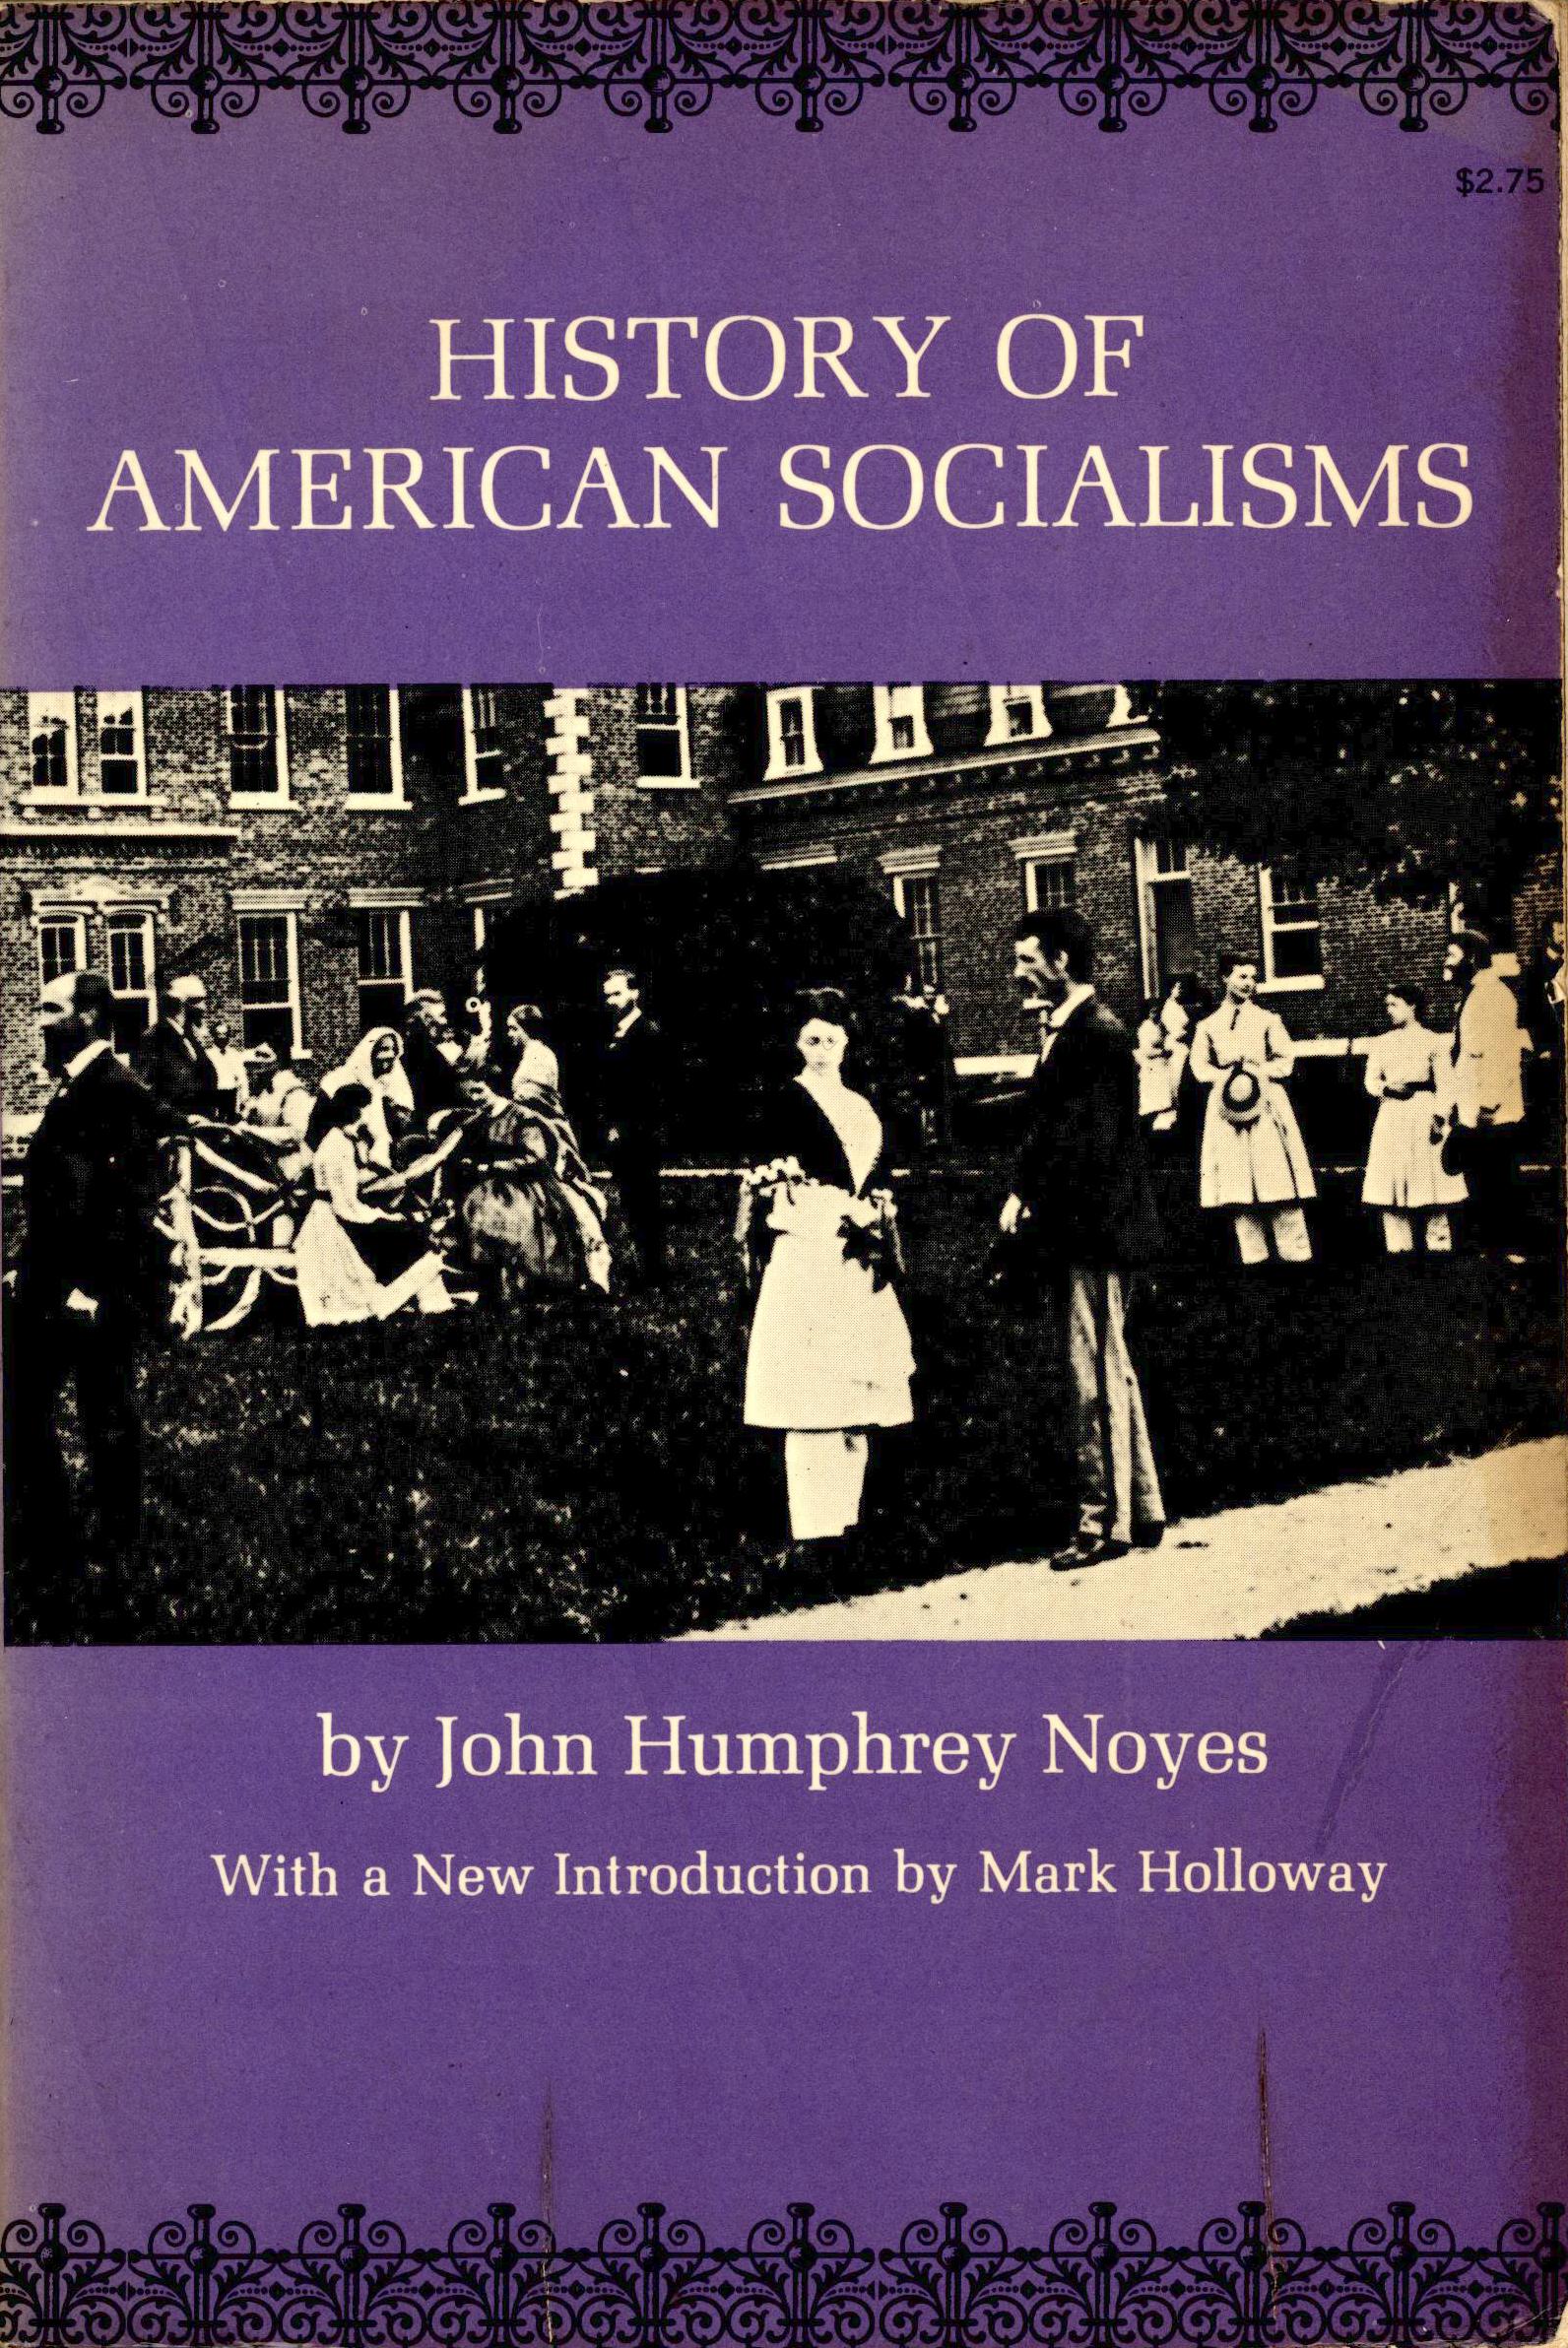 John Humphrey Noyes: History of American Socialisms